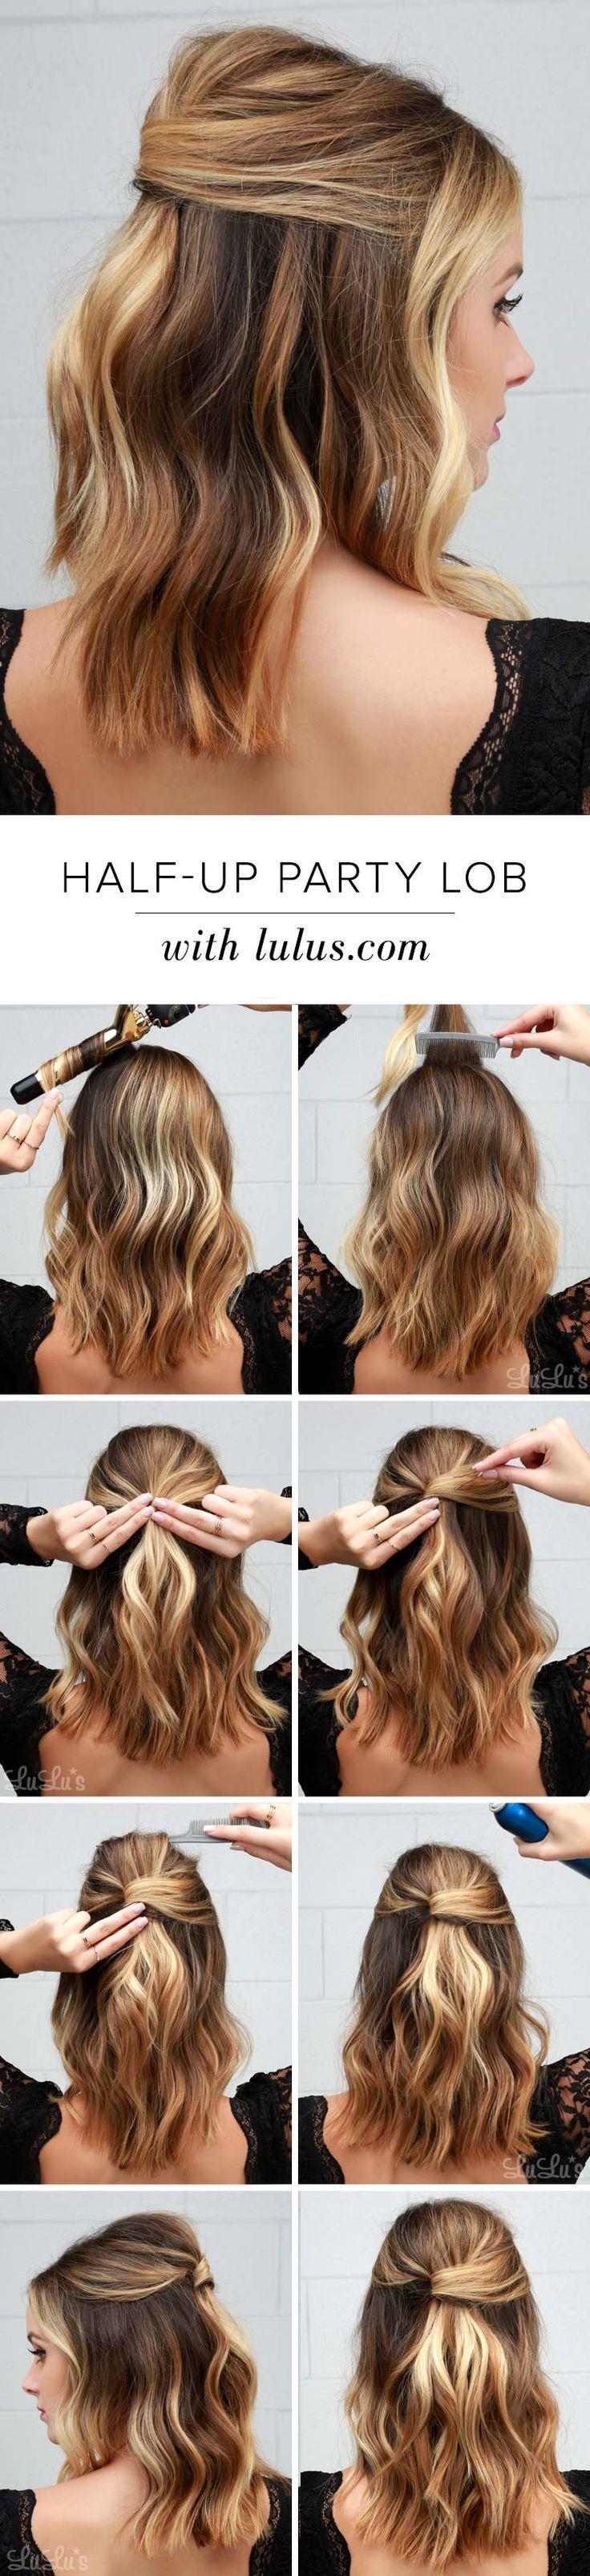 Beautiful hairstyles for parties #curls #frisurenlocken #selbermachen # ideas #frisu …  #beautiful